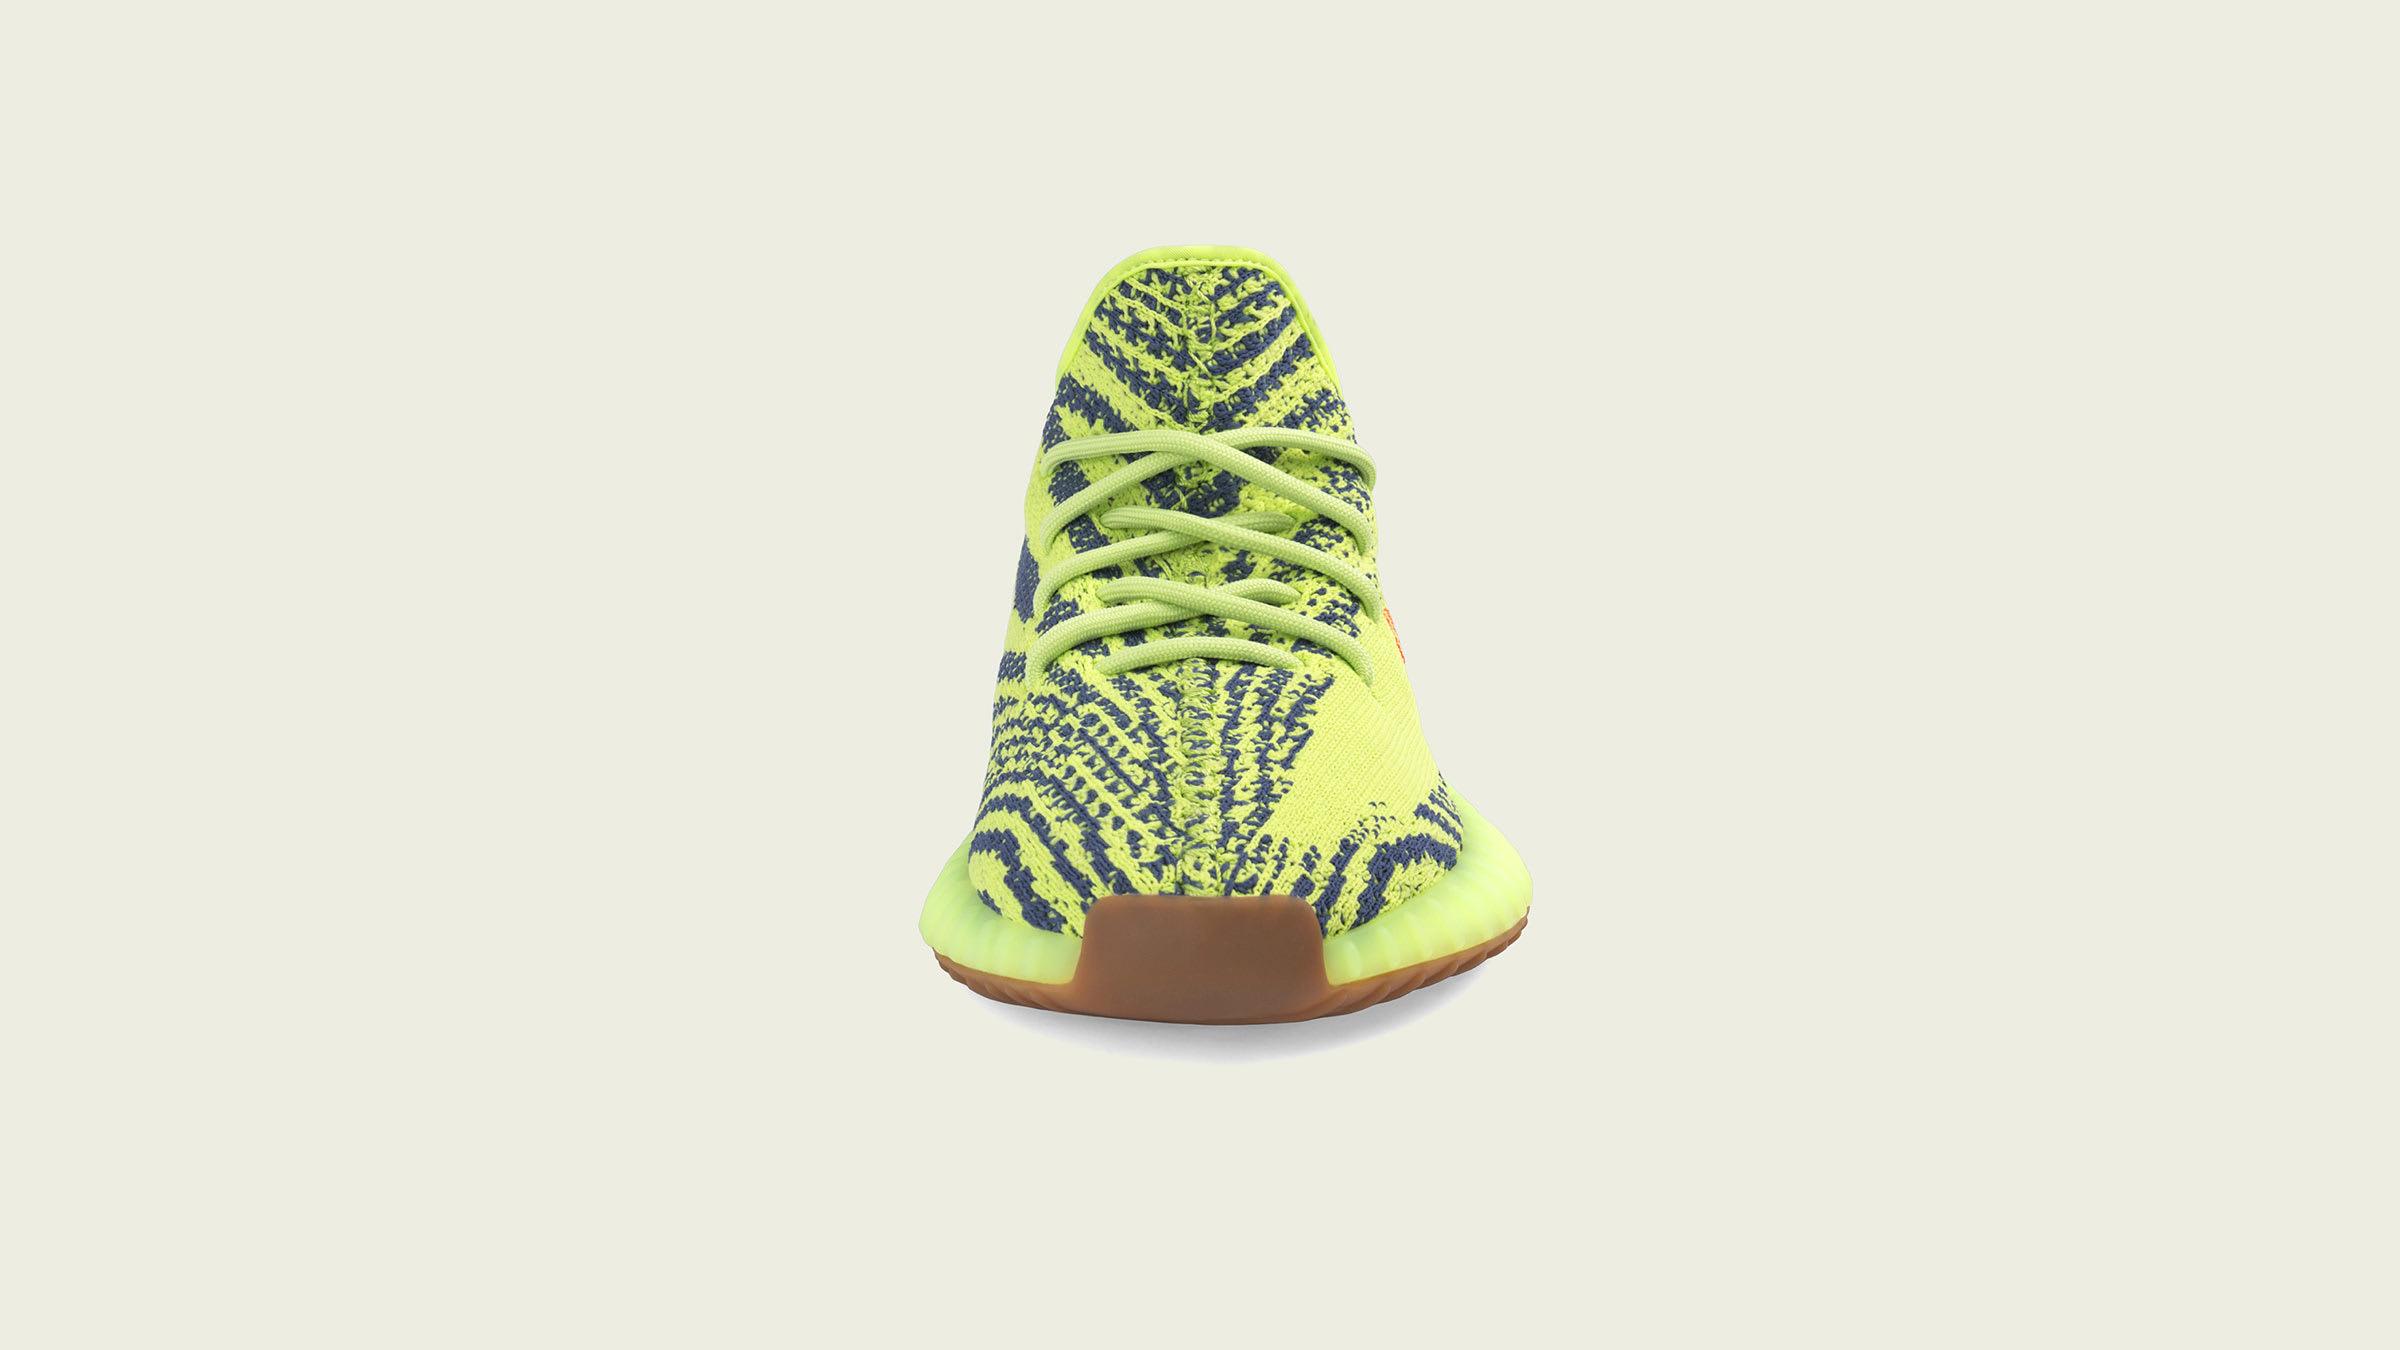 dfda3b2b07739 Adidas Yeezy Boost 350 V2 (Semi Frozen Yellow   Raw Steel)